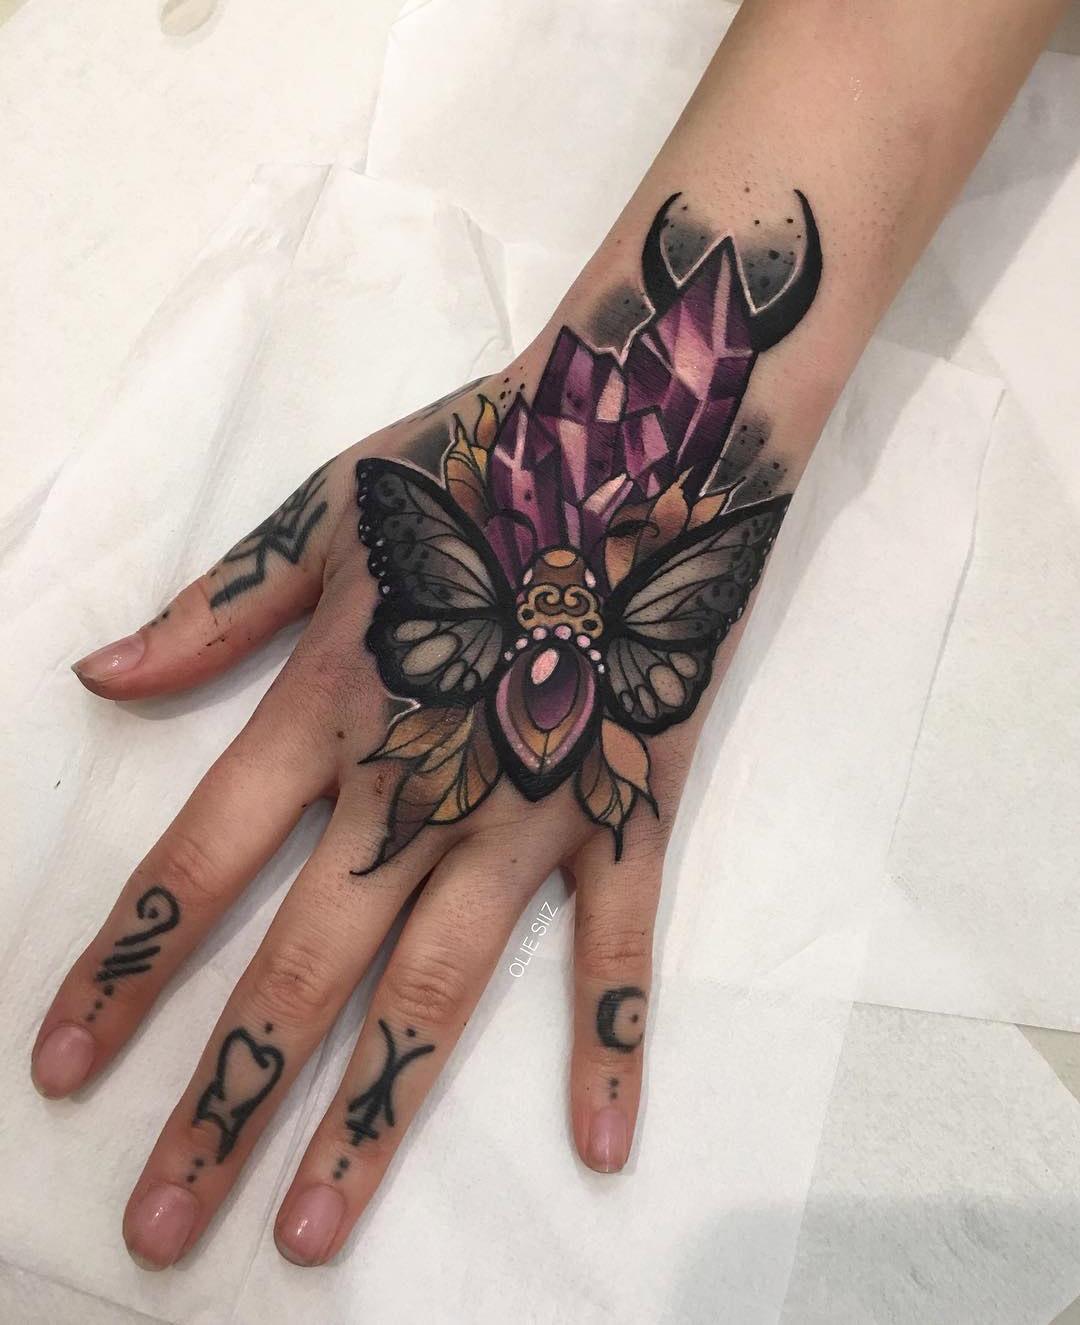 moth crystals girls hand tattoo best tattoo design ideas. Black Bedroom Furniture Sets. Home Design Ideas